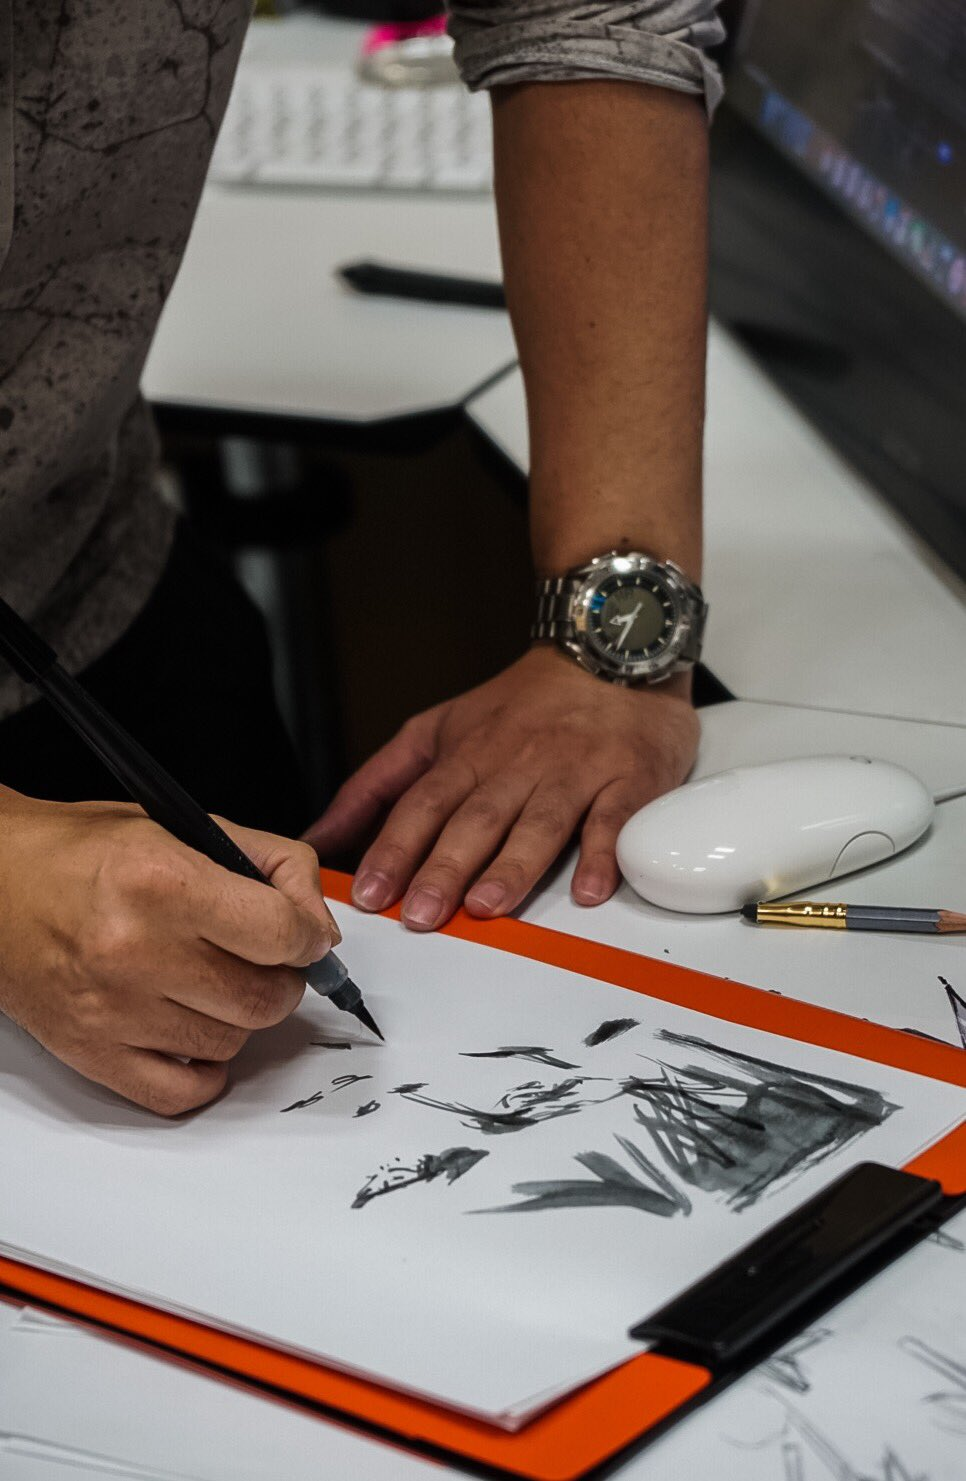 Yoji Shinkawa dessinant Mads Mikkelsen, le 25 janvier 2017